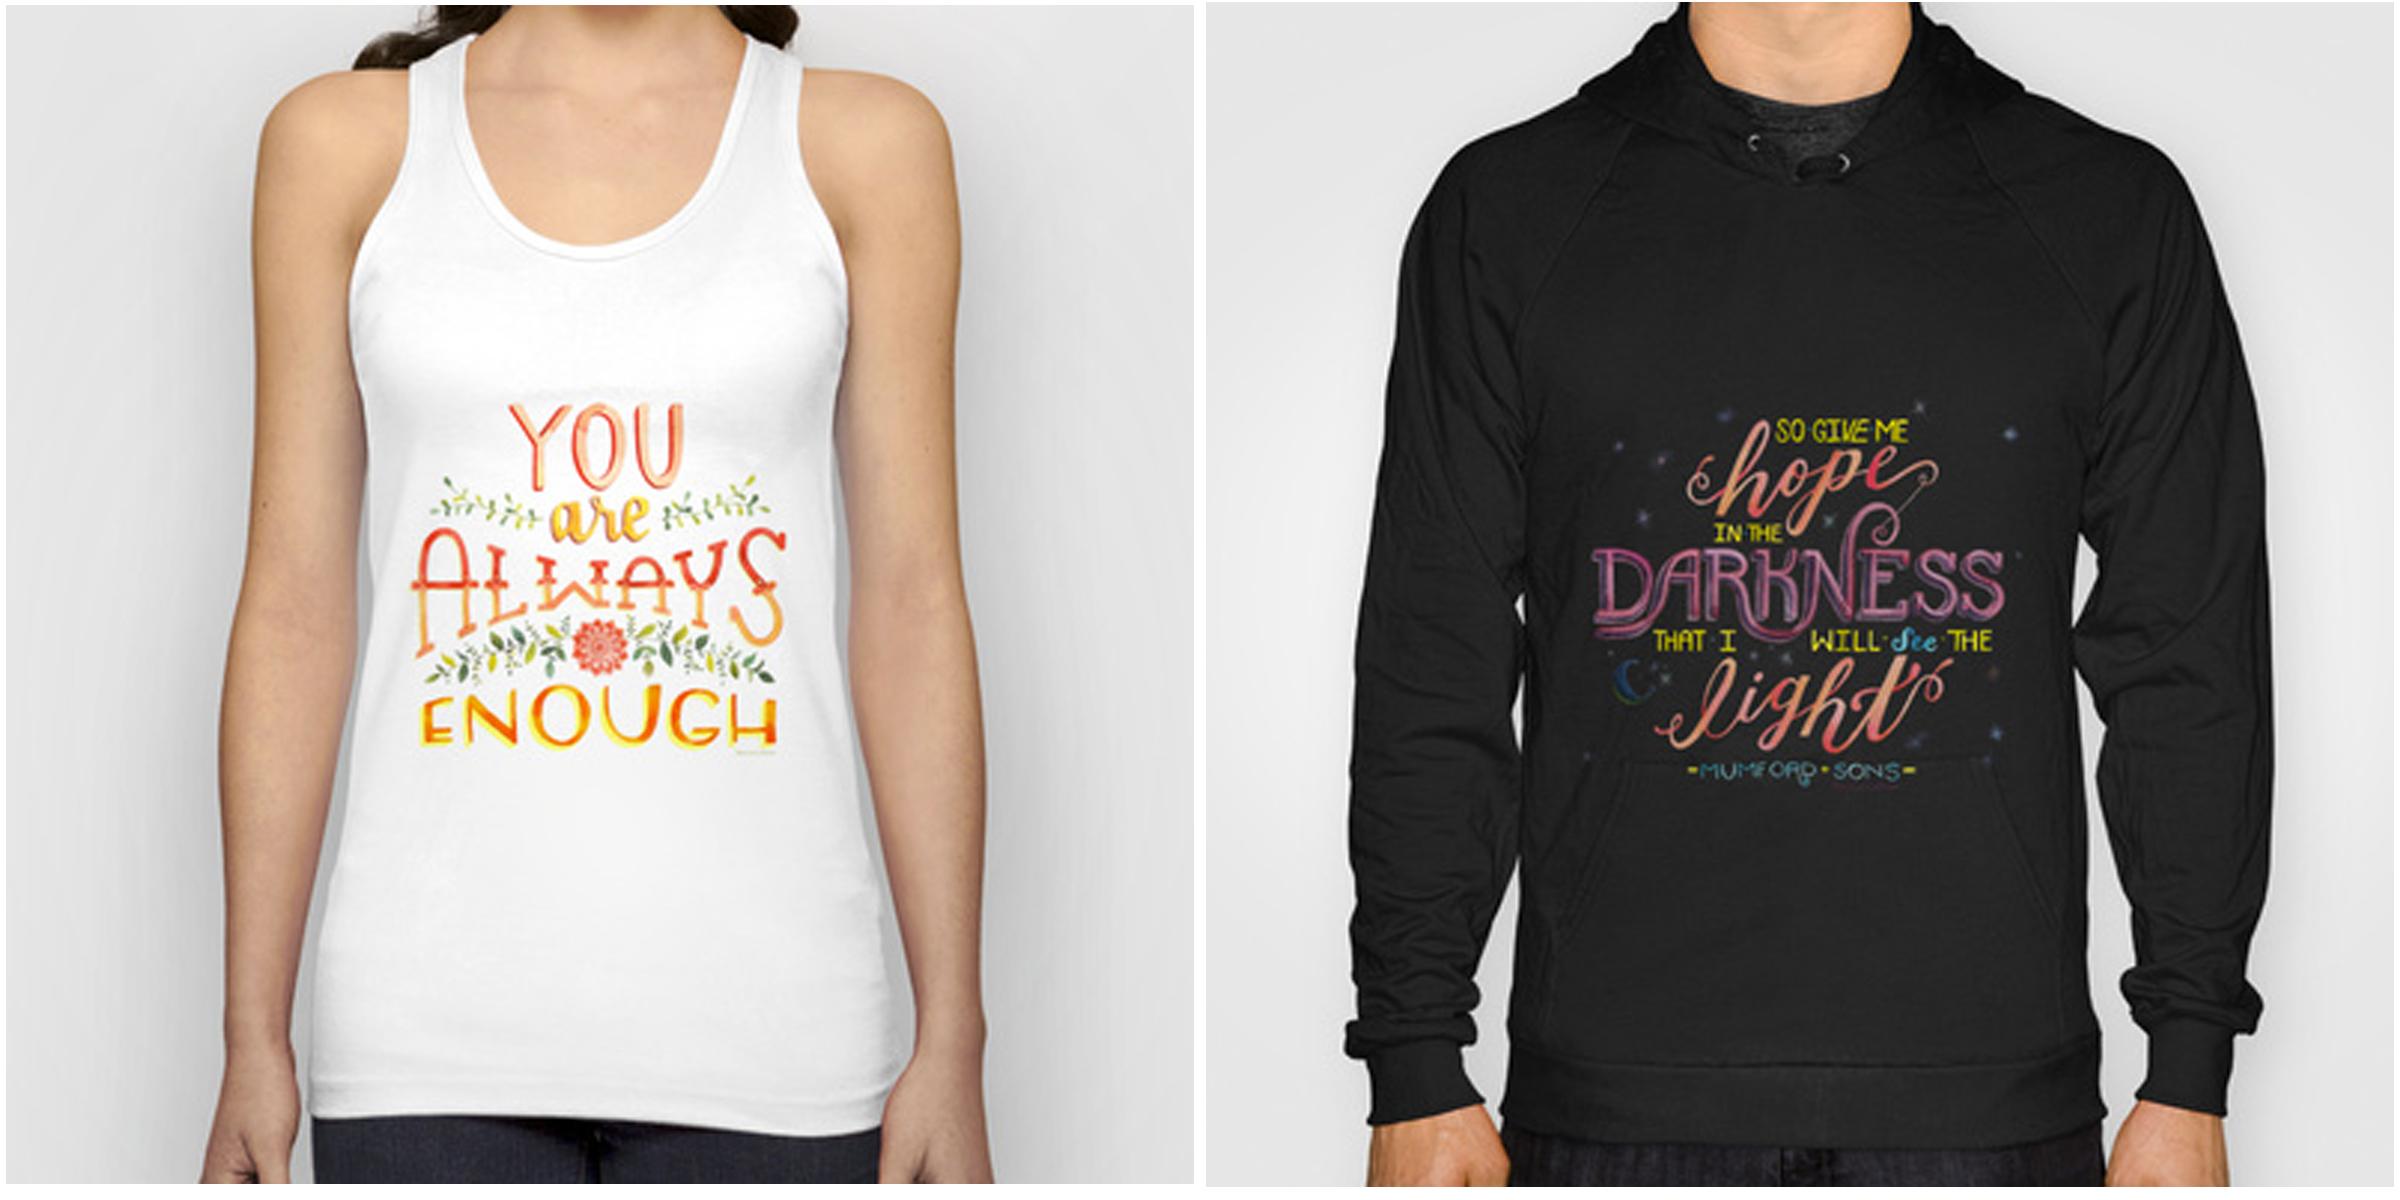 becca cahan society6 apparel.jpg